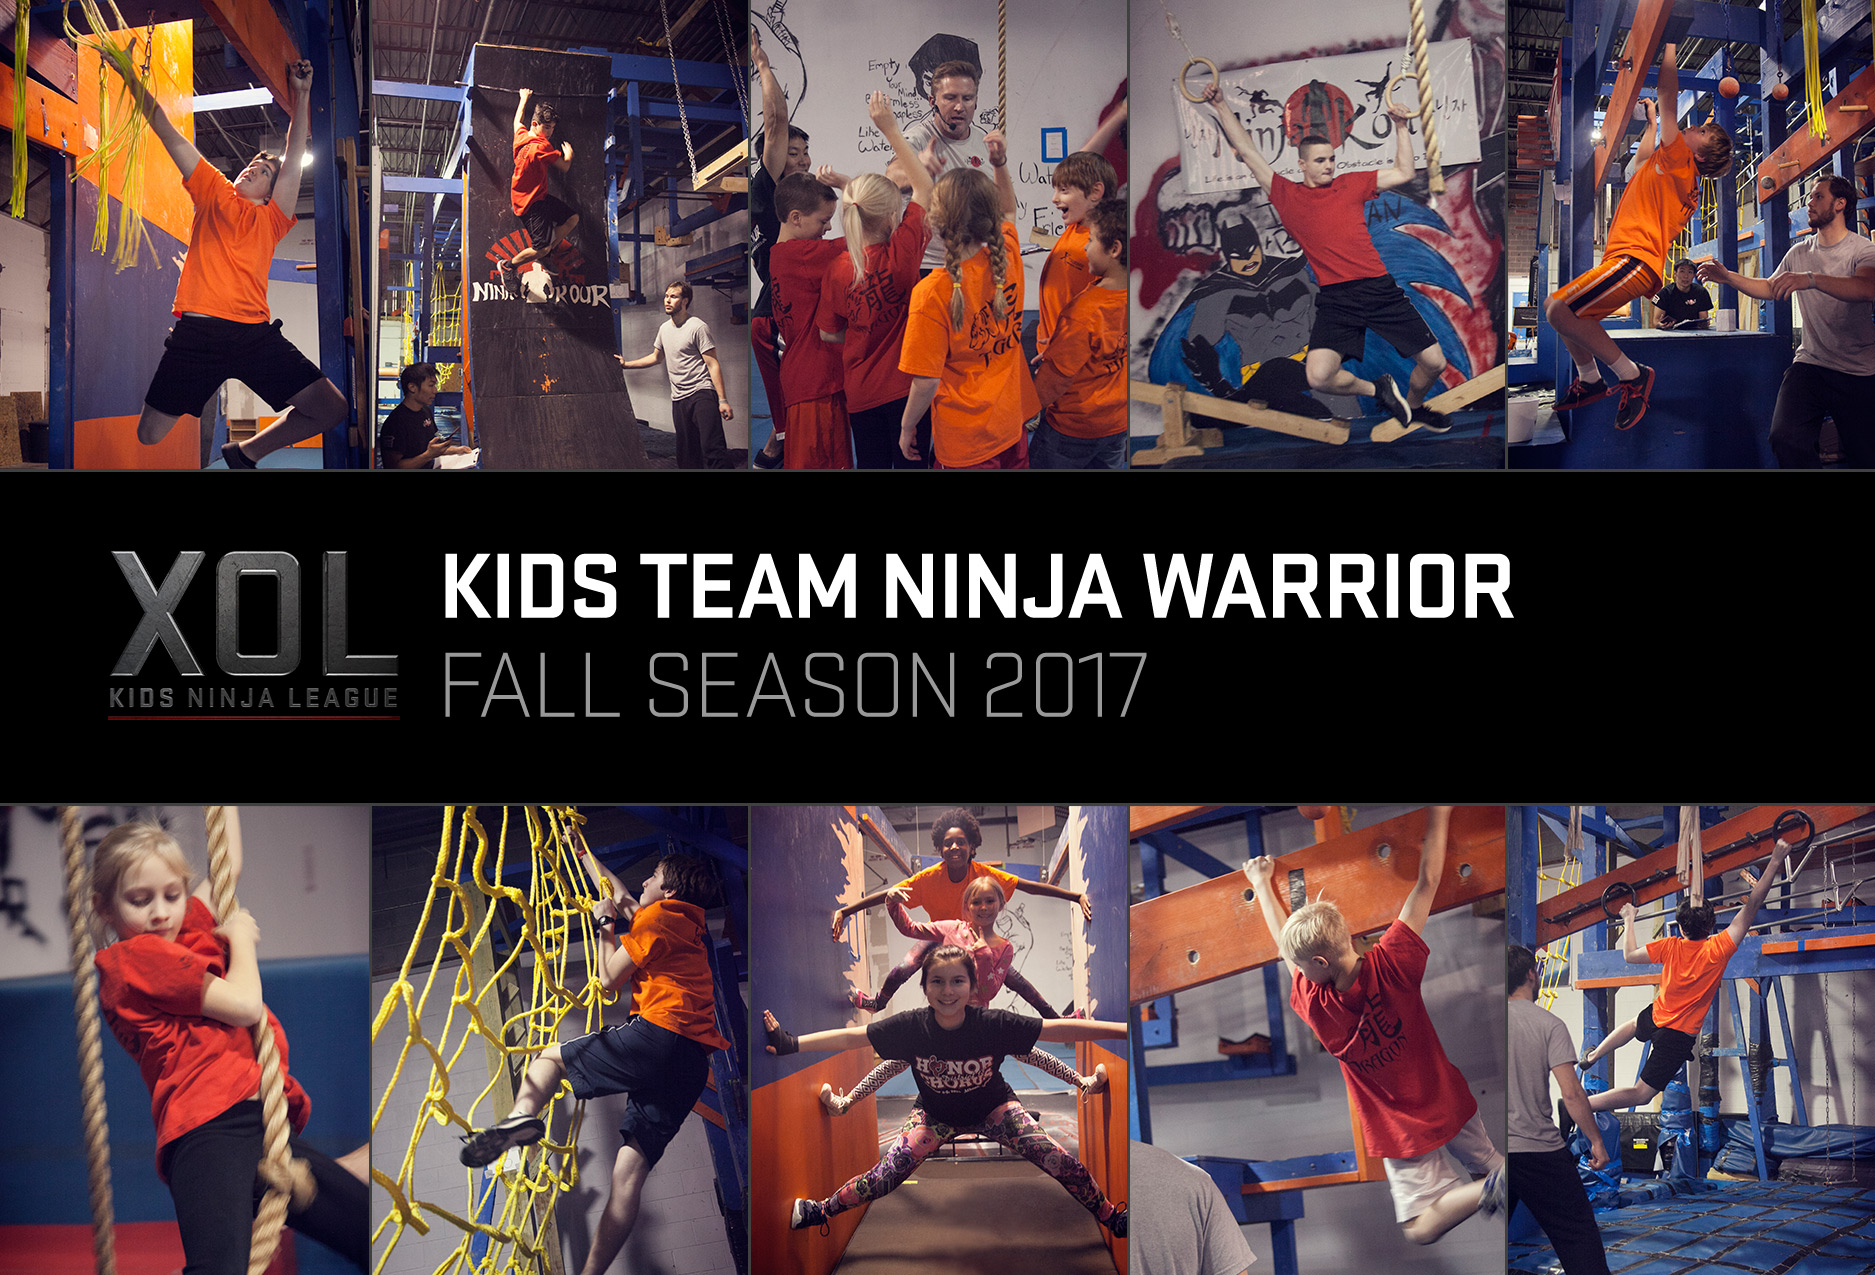 kids team ninja warrior